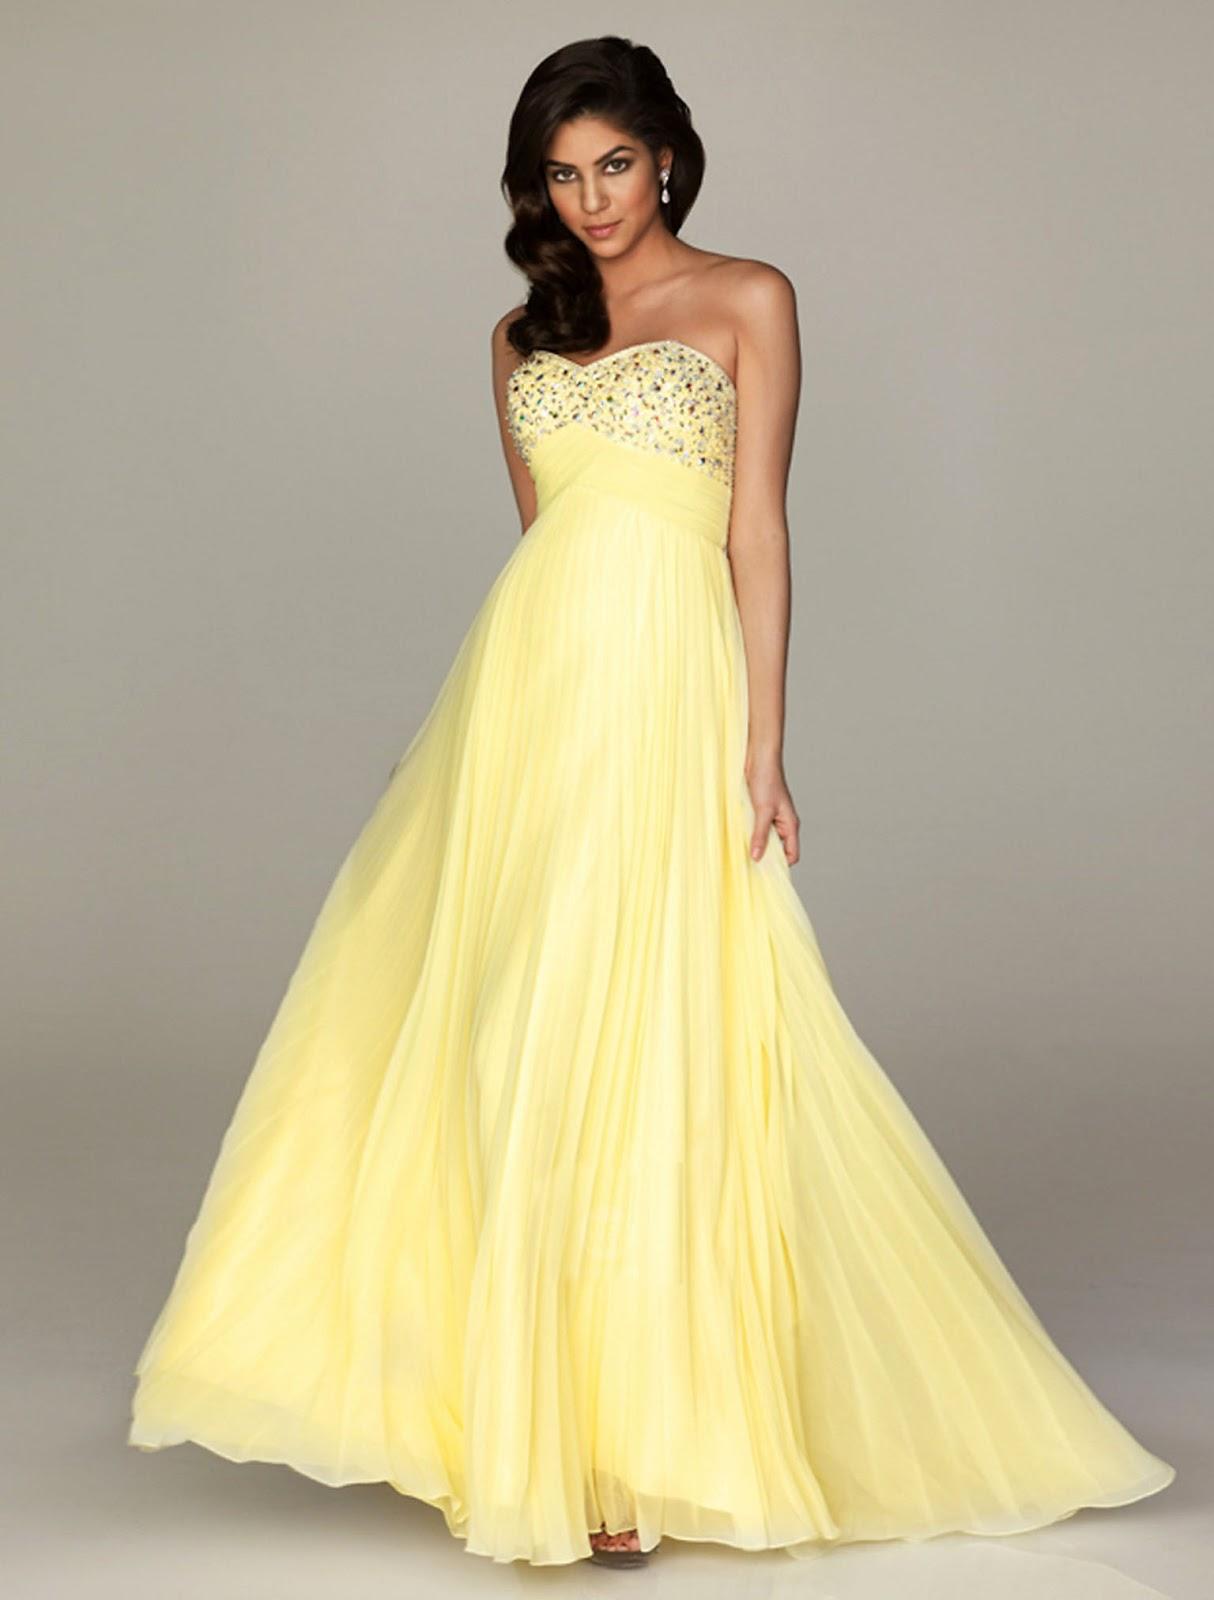 wedding dresses 2016 summer, wedding dresses 2016 trends, 2016 wedding colors, prom dresses 2016, david's bridal, pronovias, wedding dresses online, wedding dresses 2016 pinterest